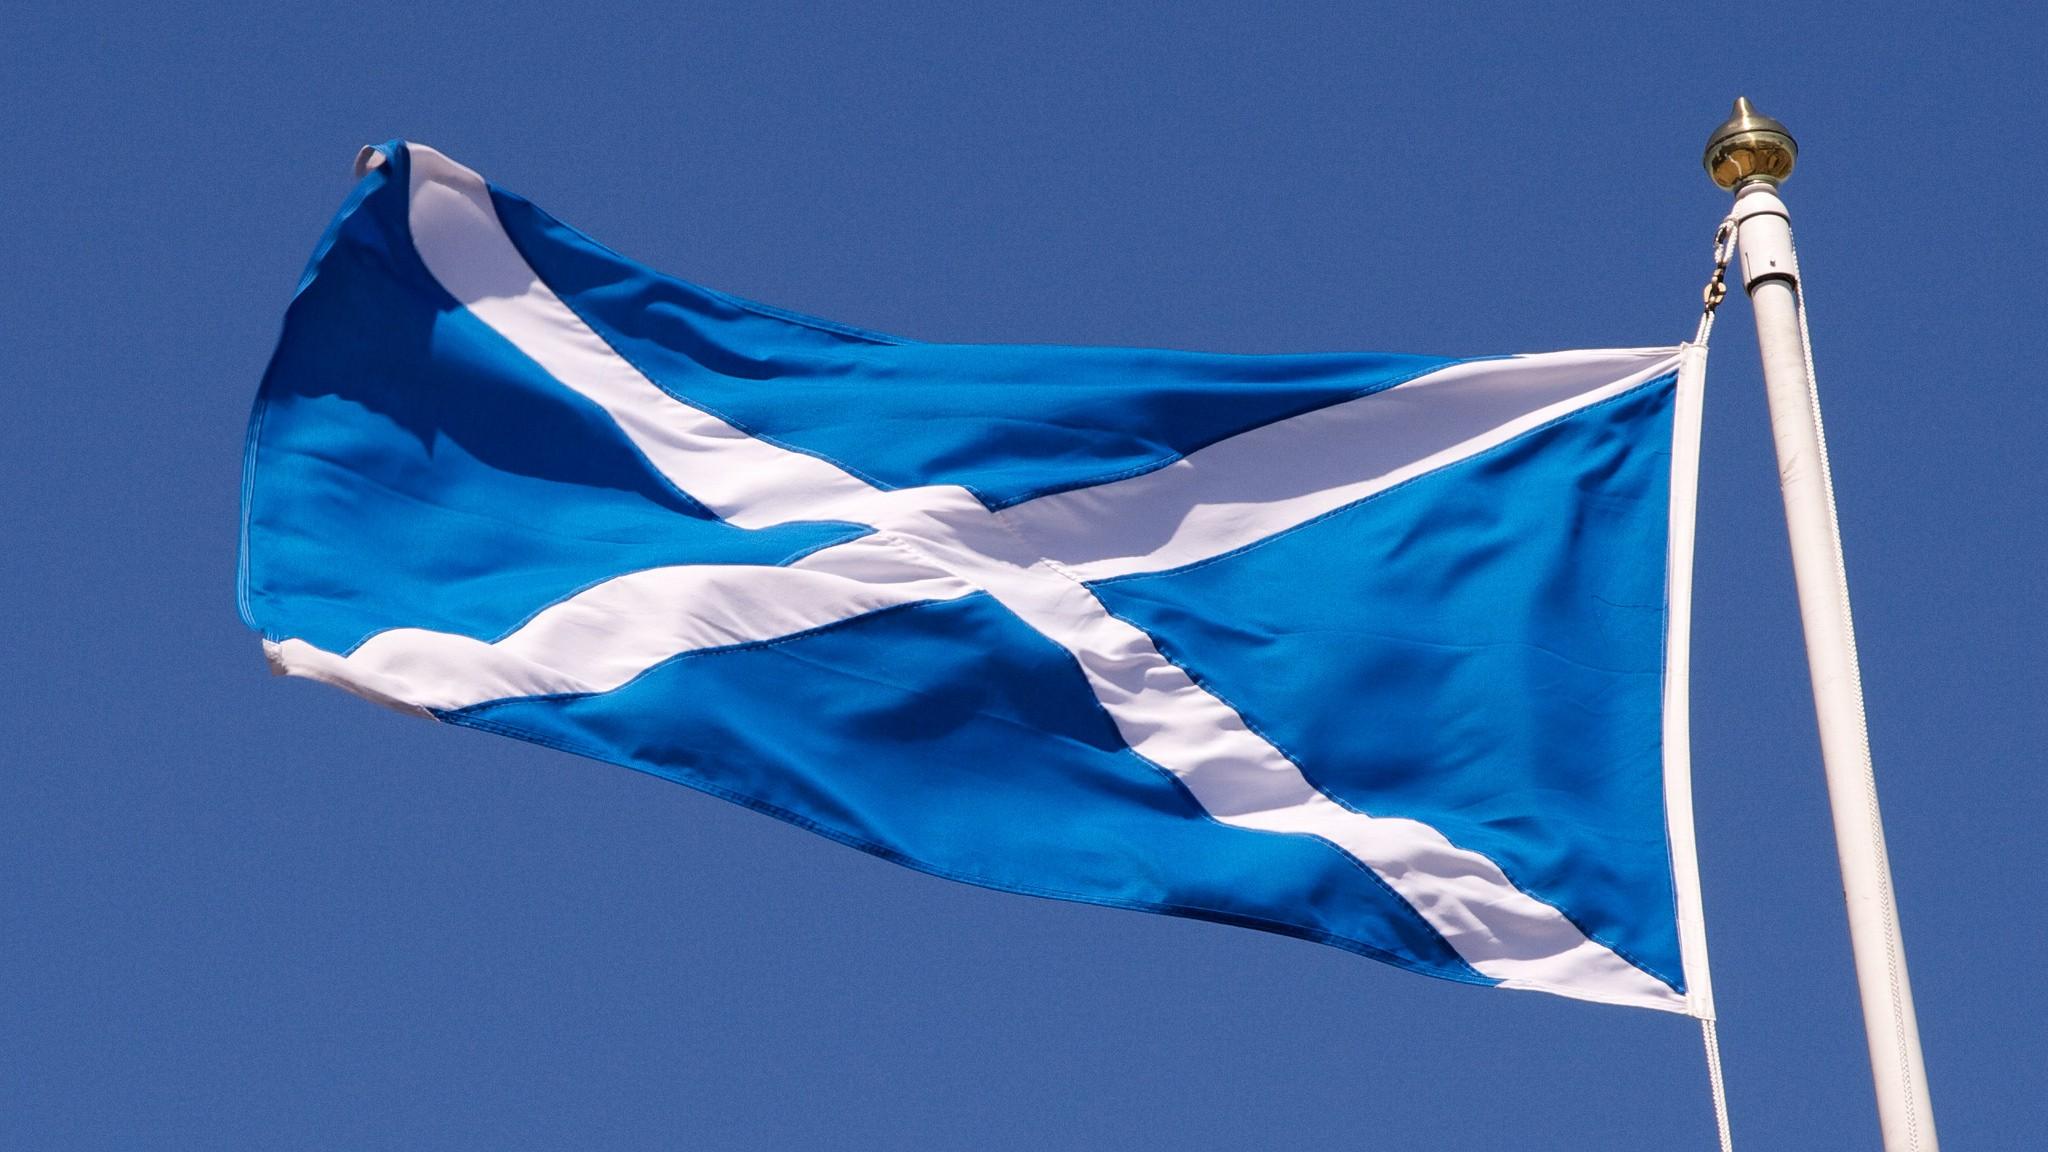 Man scottish where to meet a Single Scottish